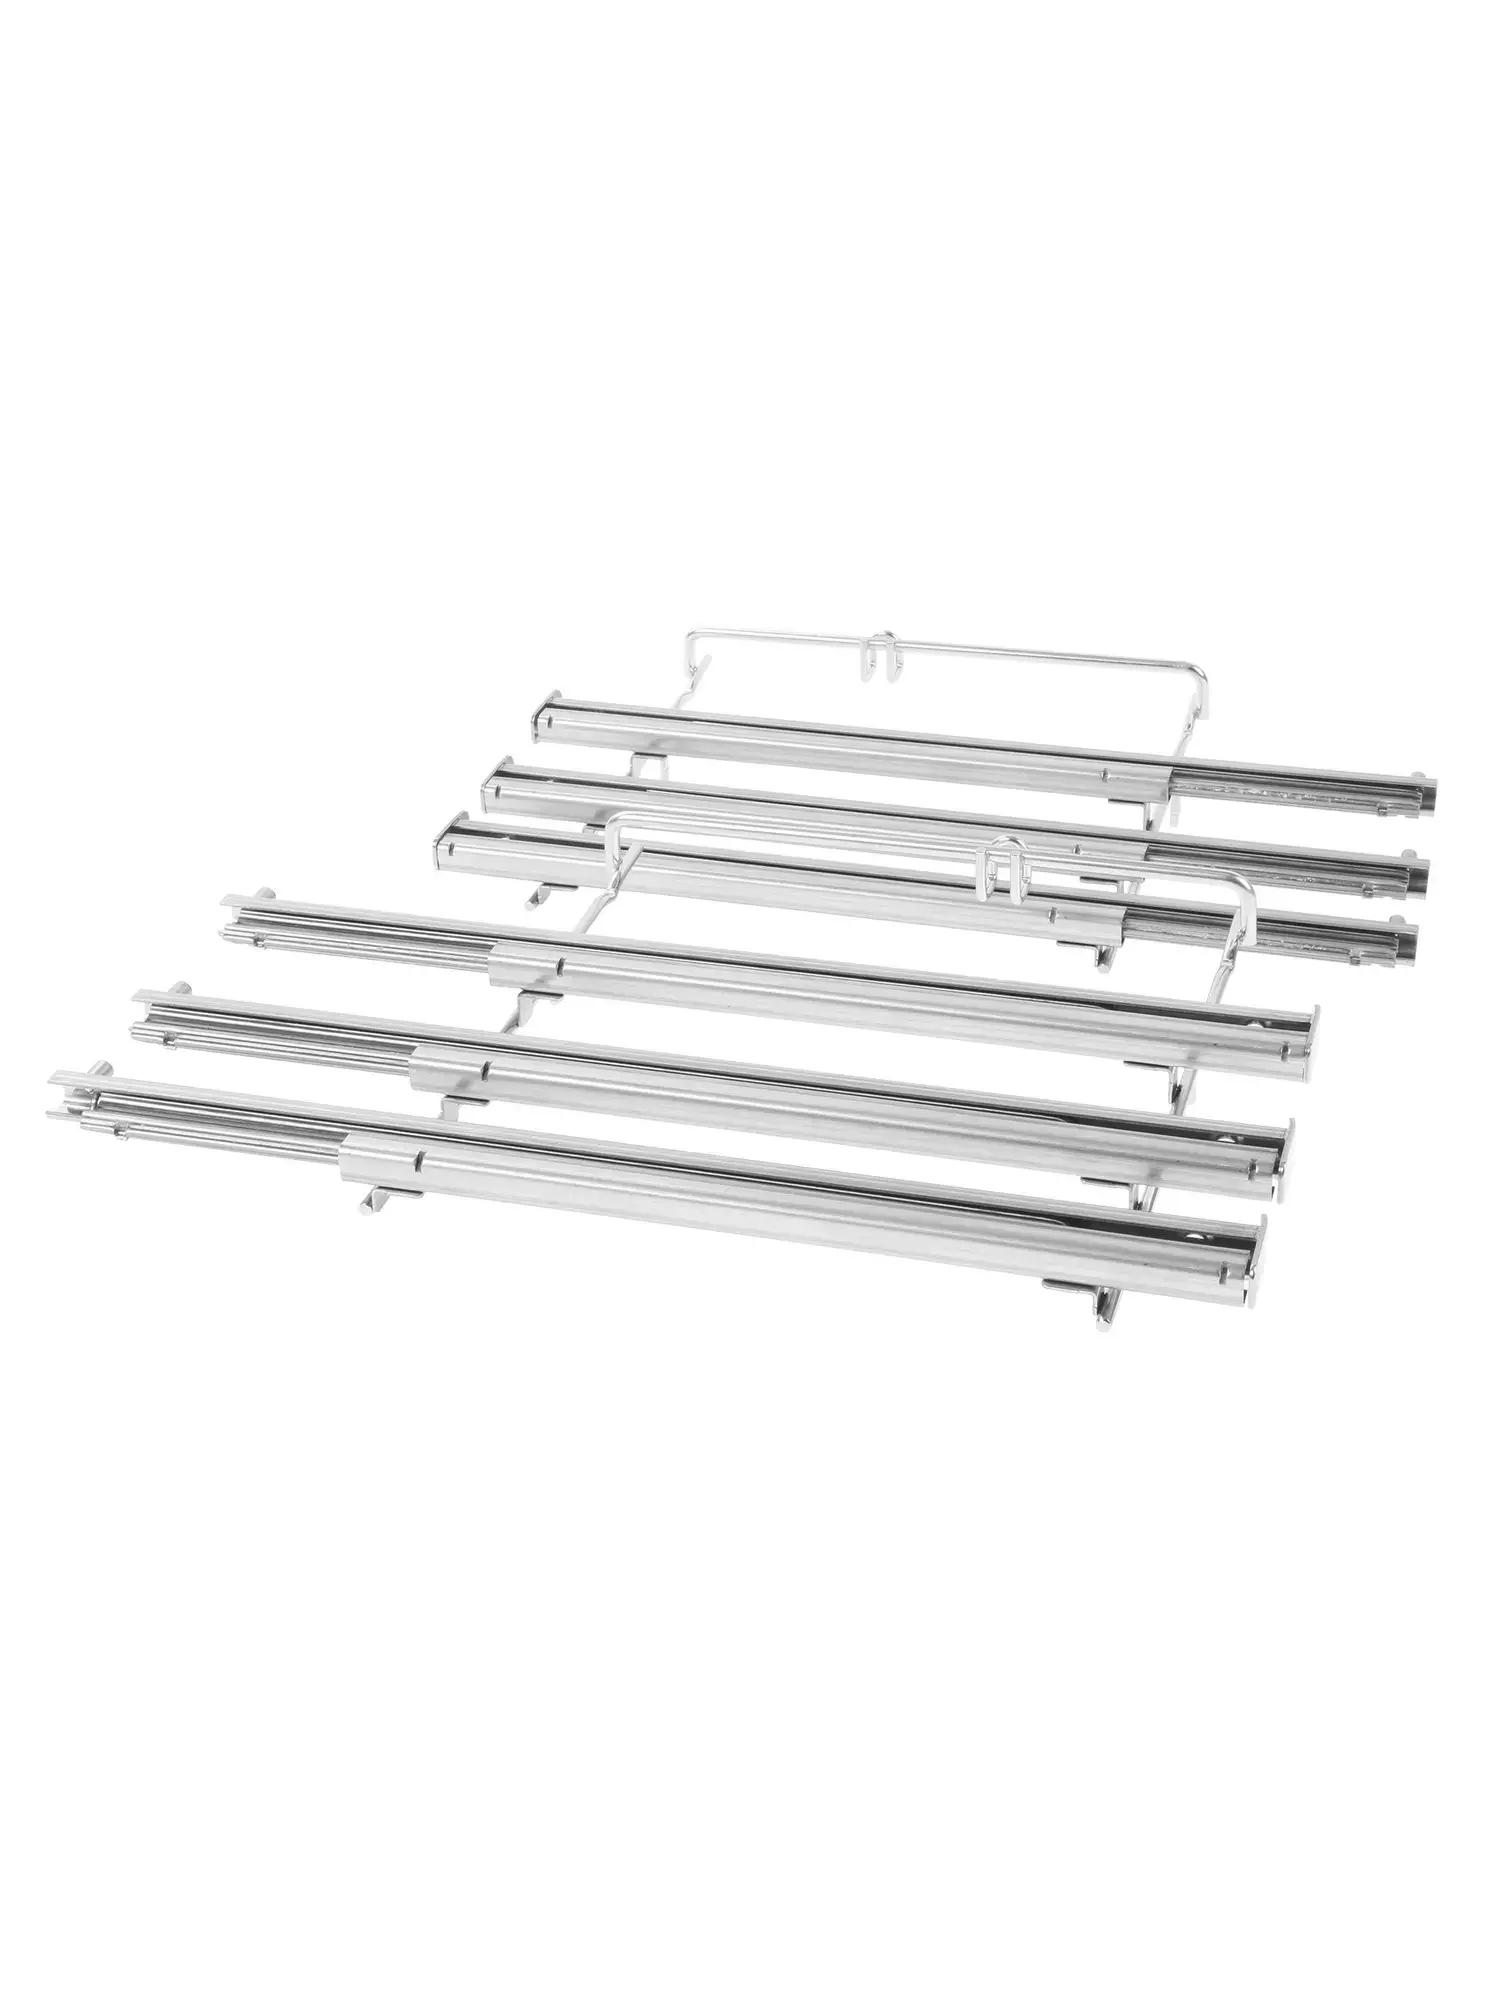 [Zweite Wahl] Neff Z11TF36X0 Teleskopvollauszug Aluminium